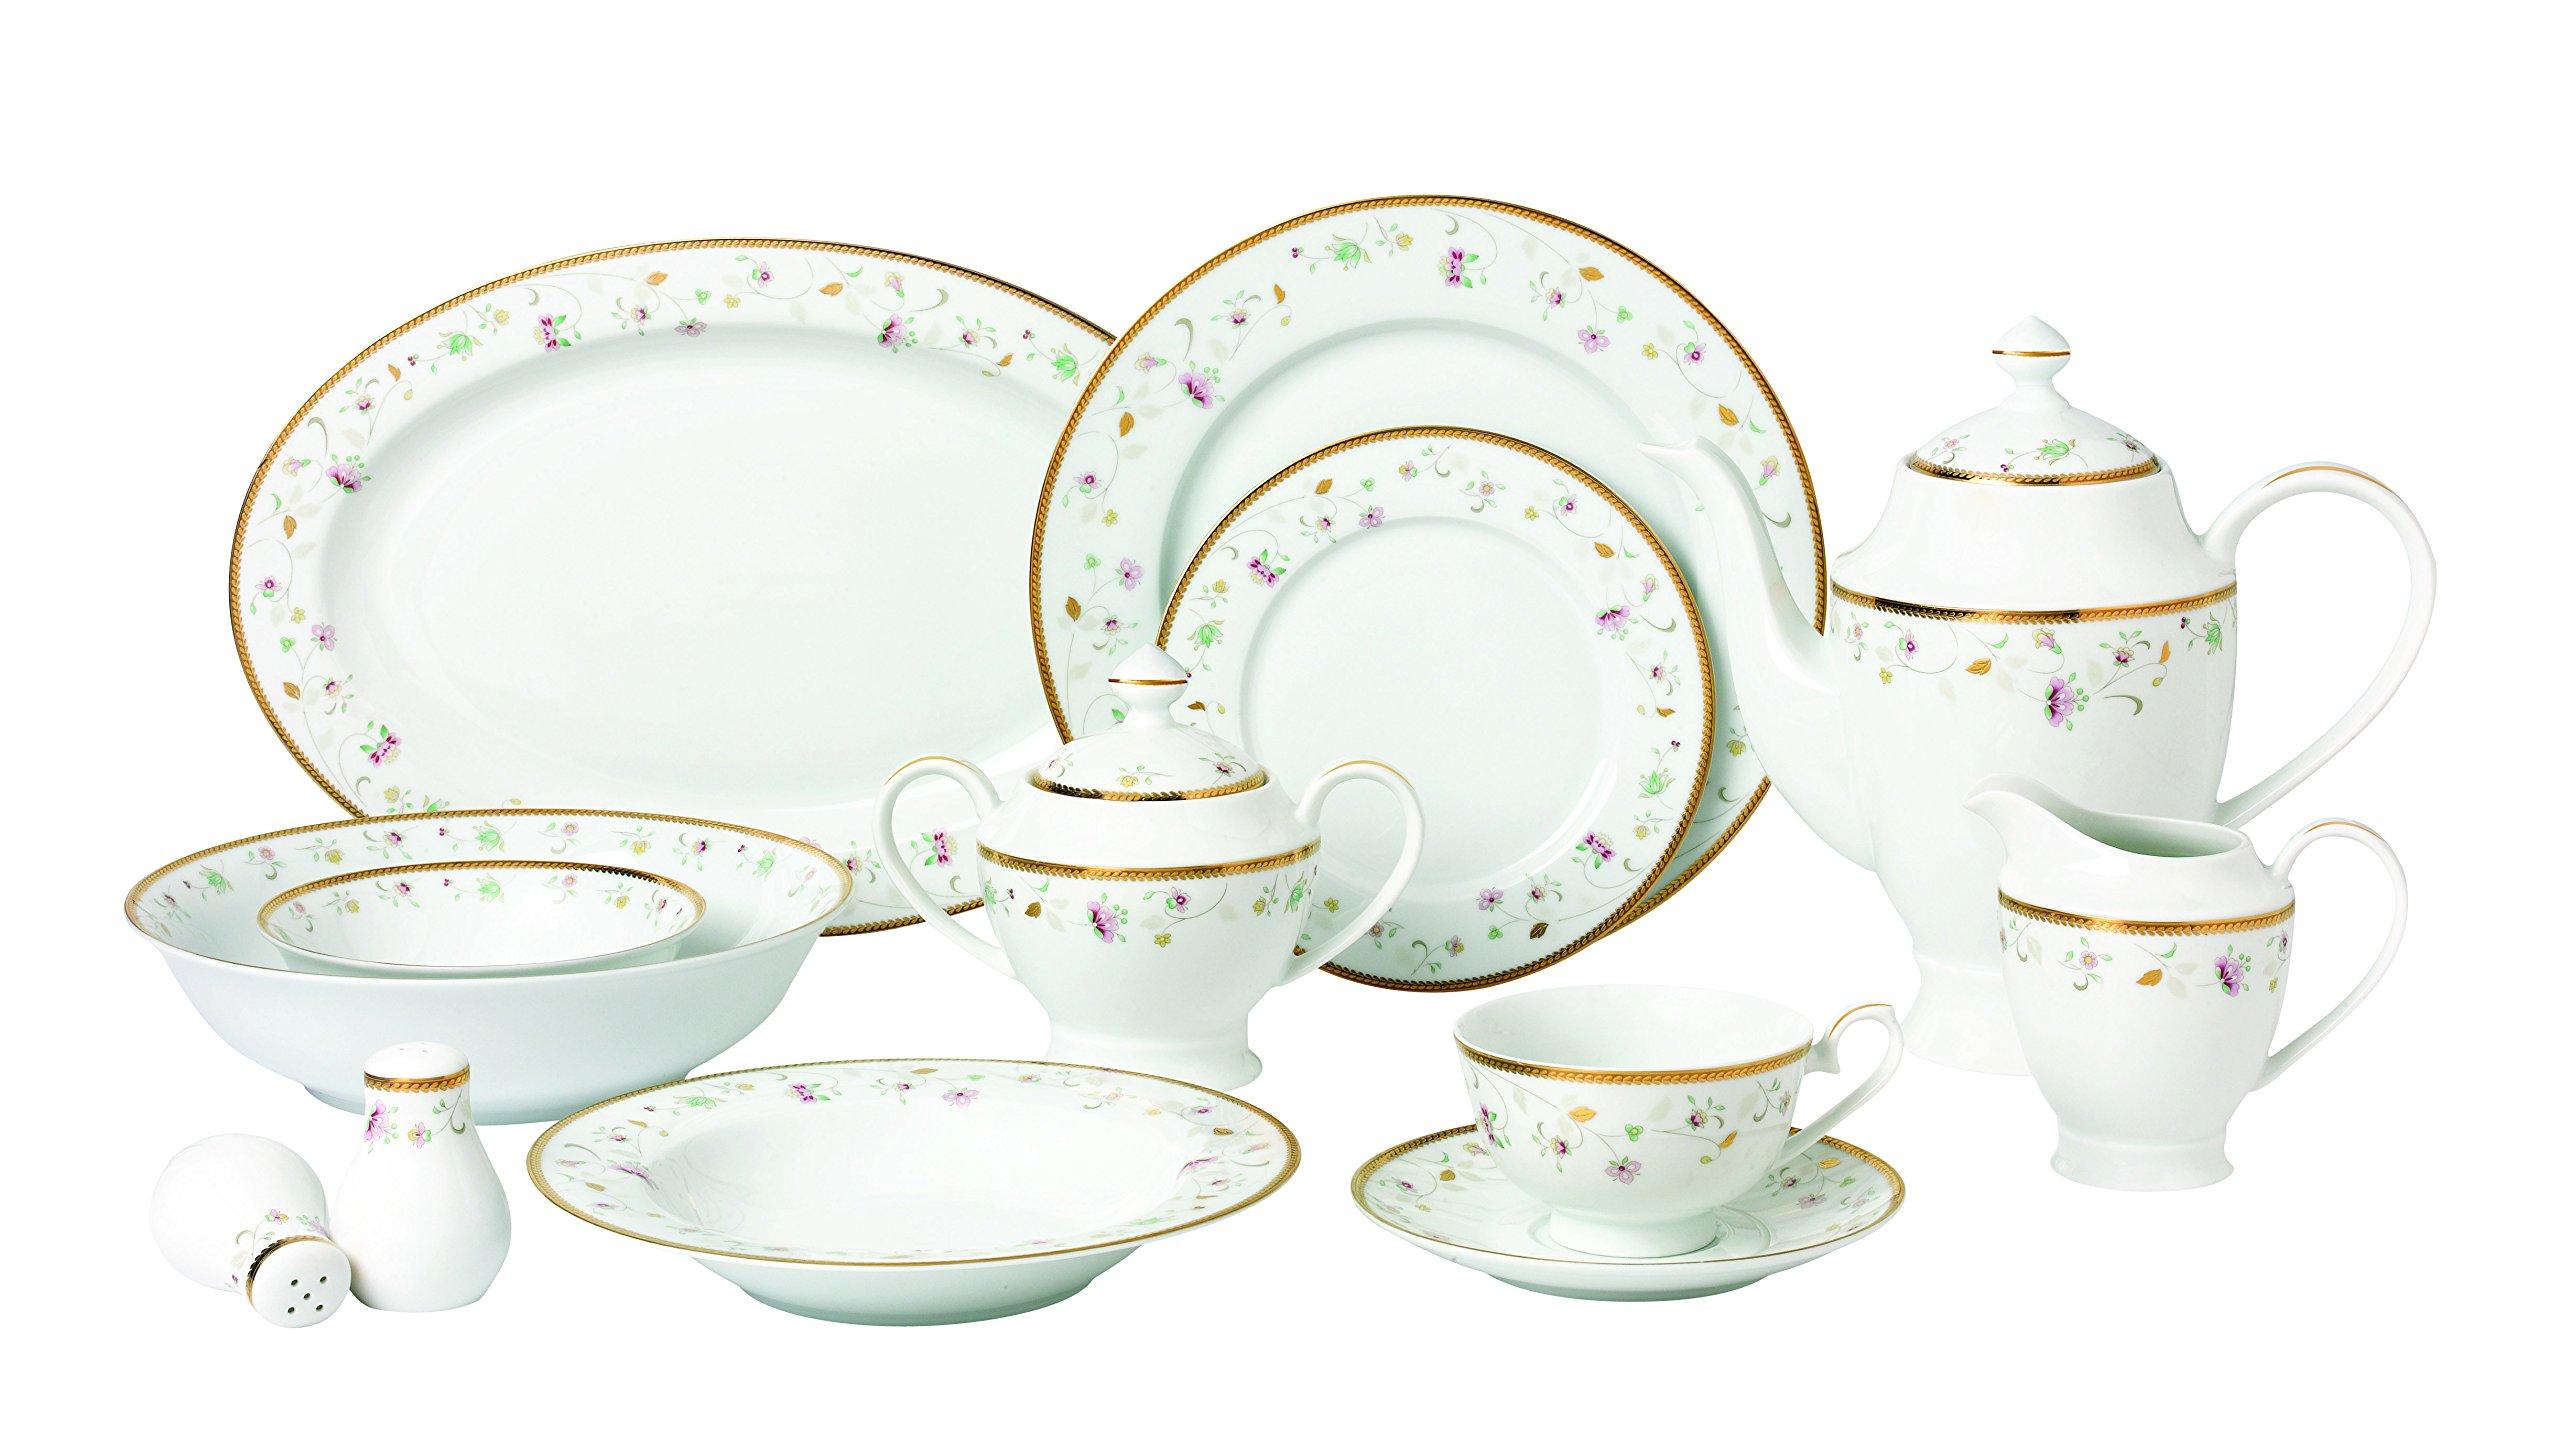 Lorren Home Trends 57 Piece 'Greta' Bone China Dinnerware Set (Service for 8 People), Gold